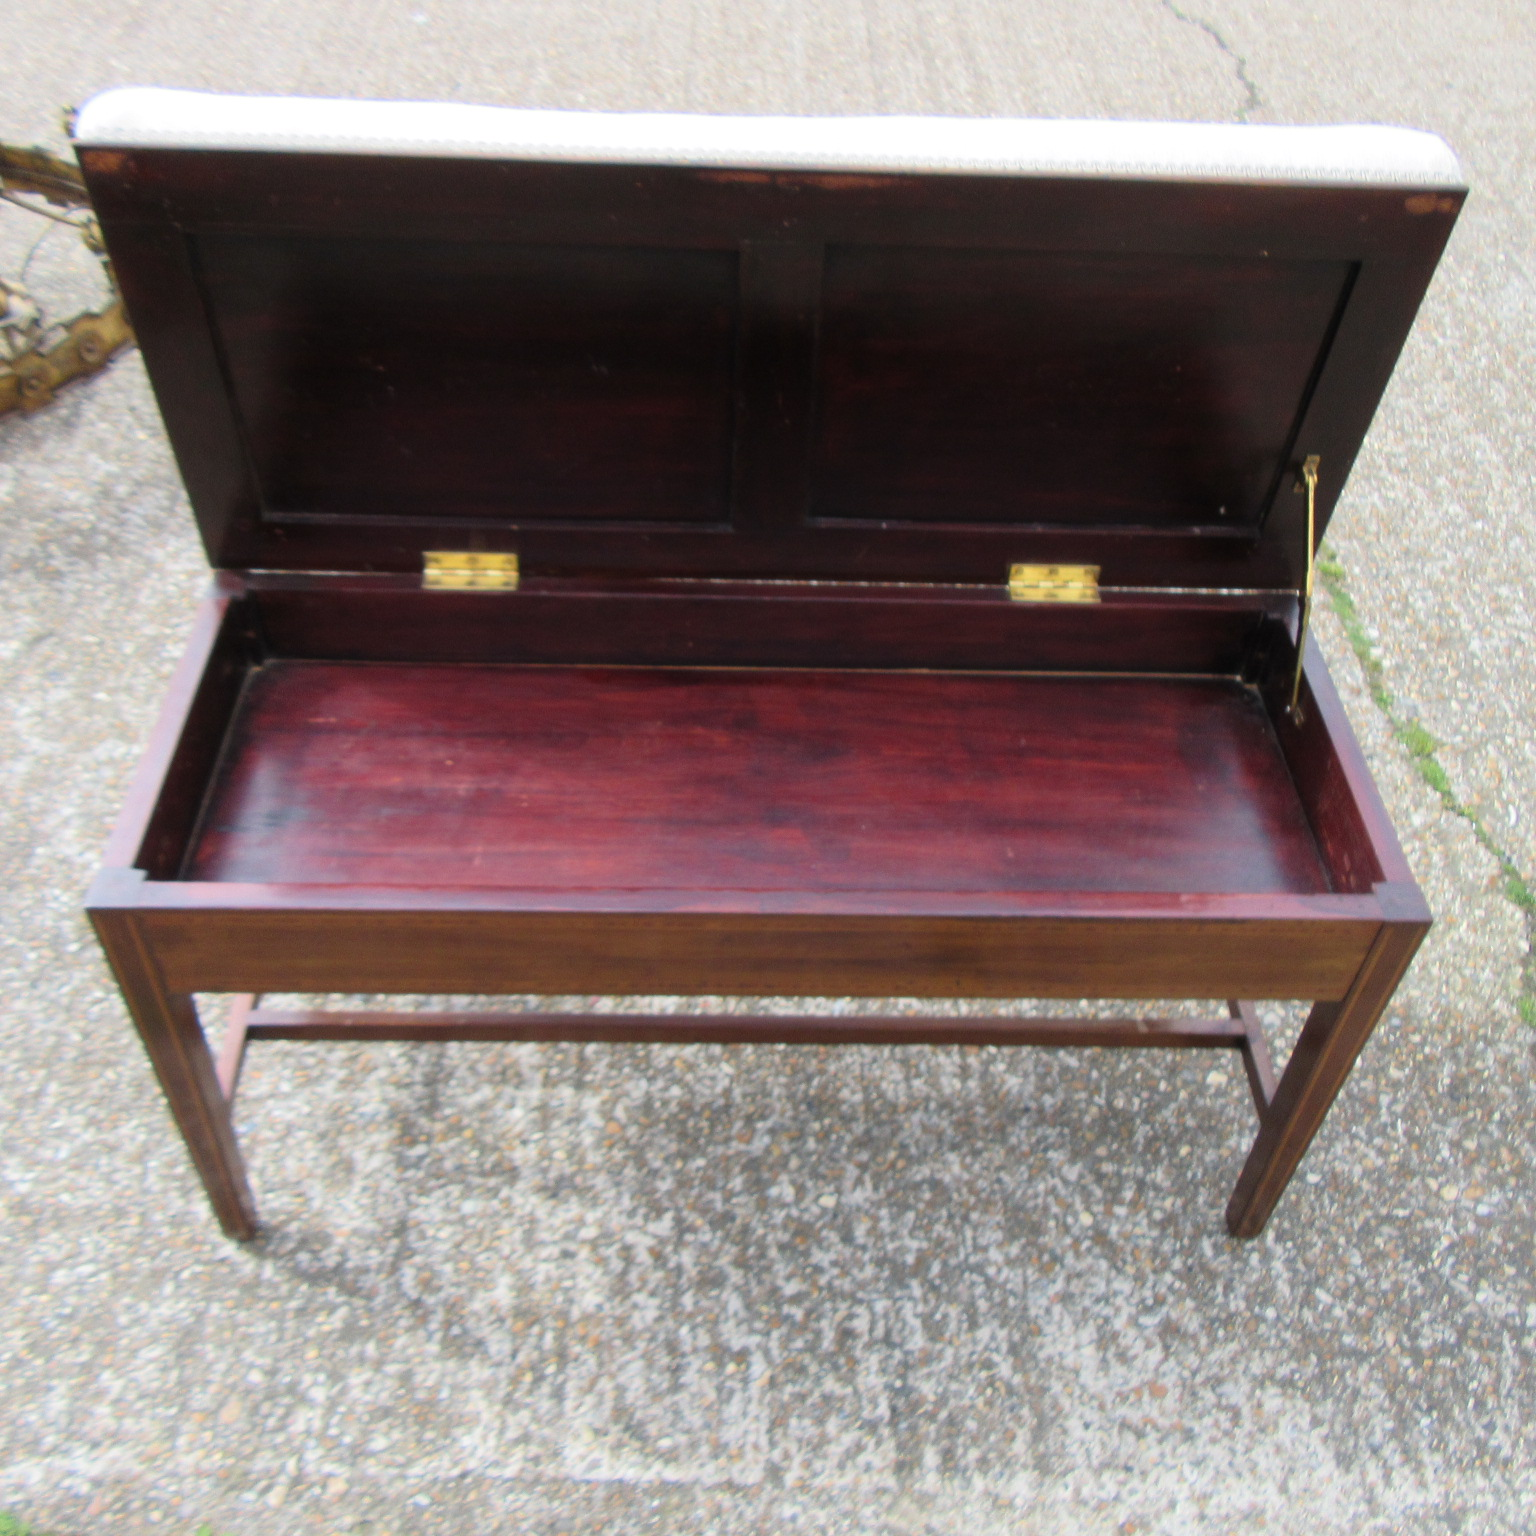 Antique Edwardian Inlaid Piano Stool Eras Of Style Eras Of Style